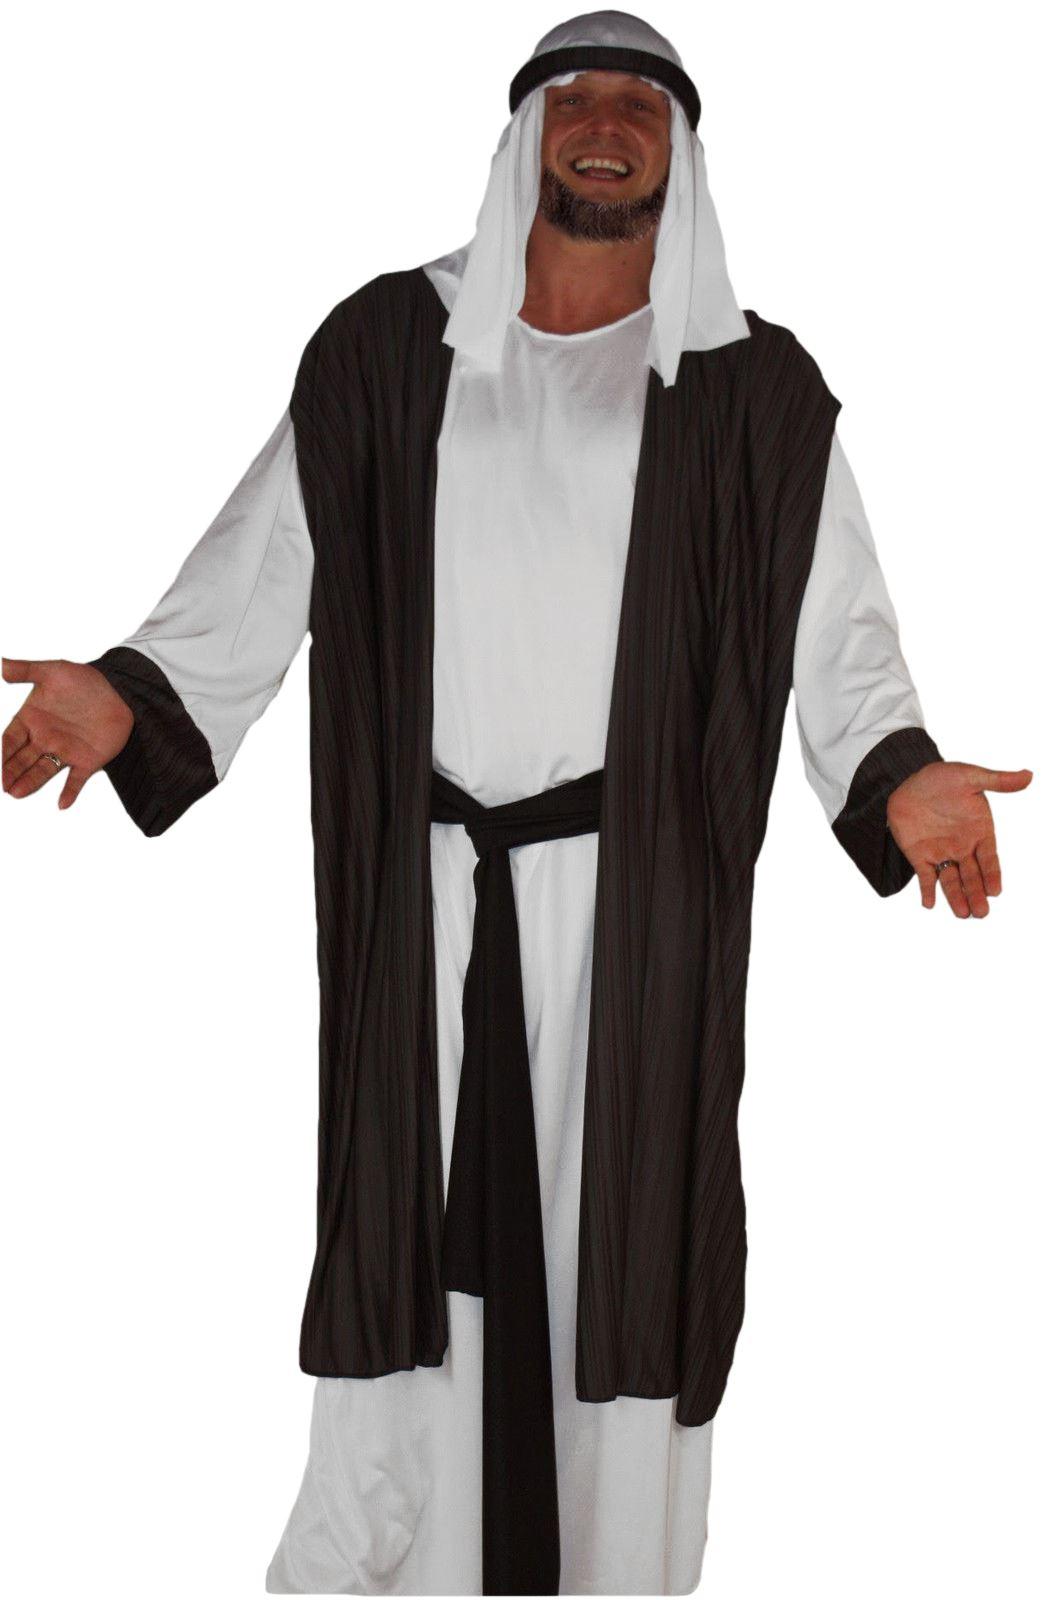 adults deluxe grey arab wise man costume christmas nativity shiek